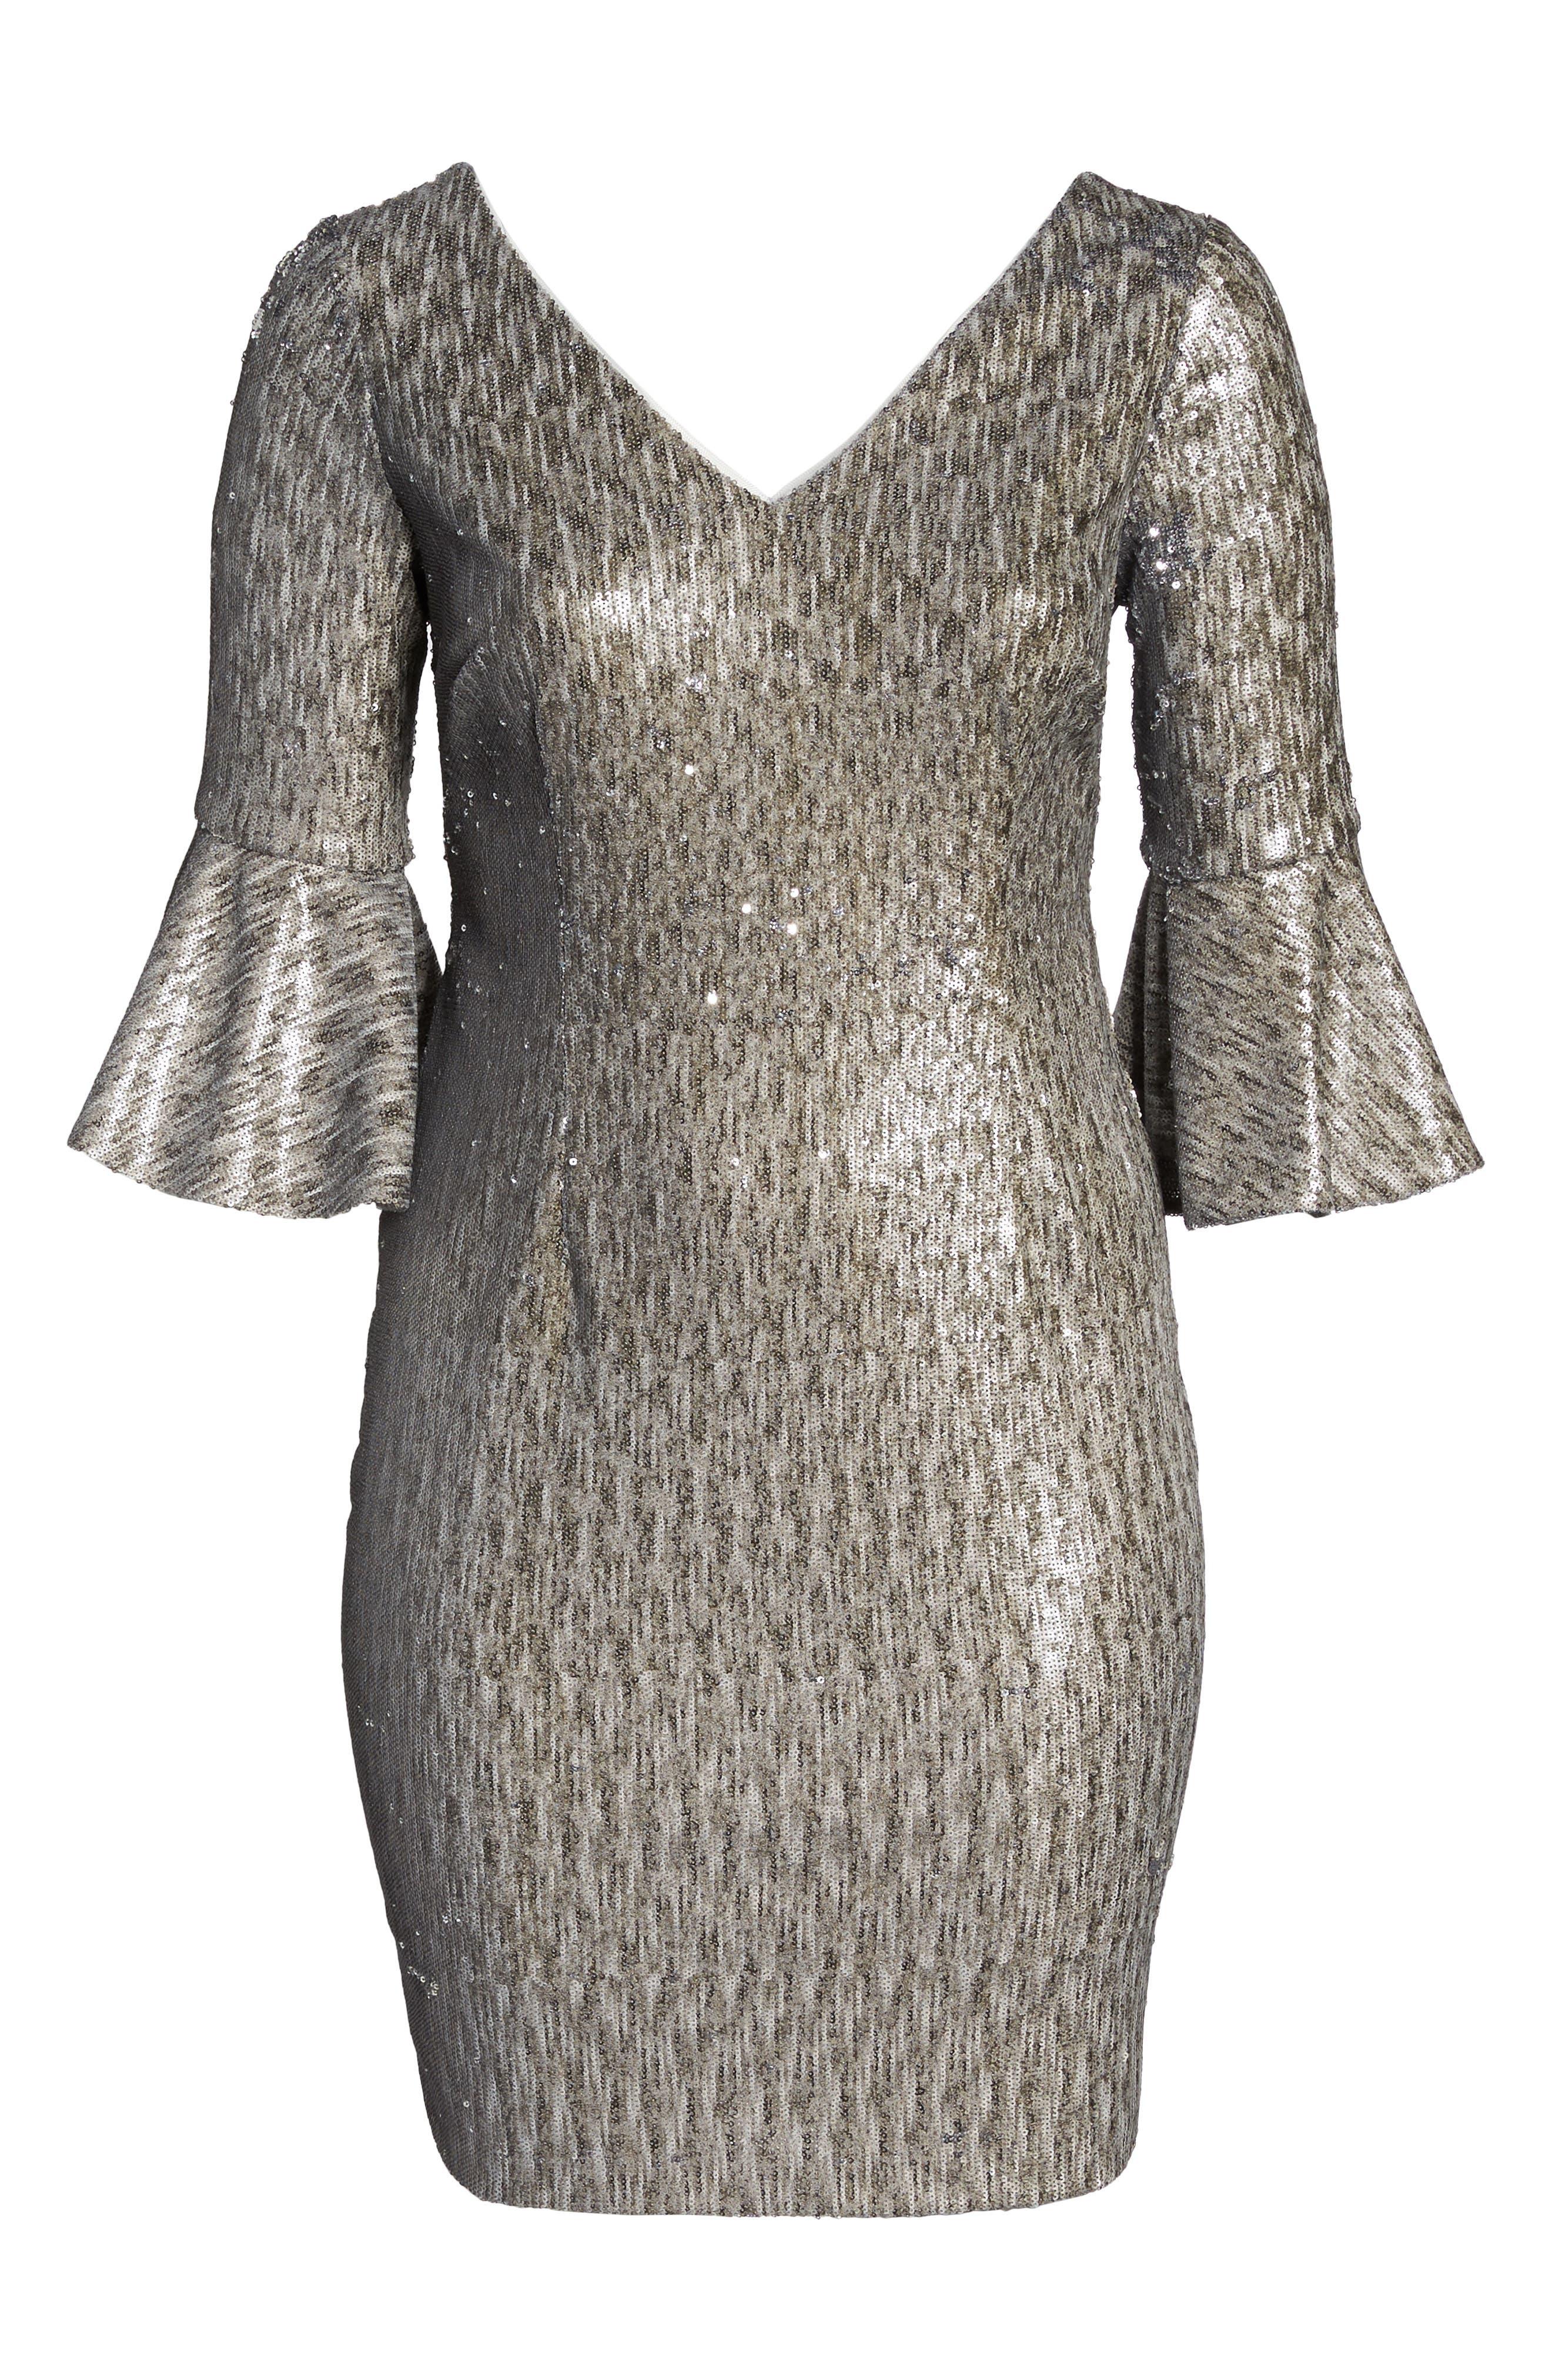 Bell Sleeve Sequin Sheath Dress,                             Alternate thumbnail 6, color,                             080